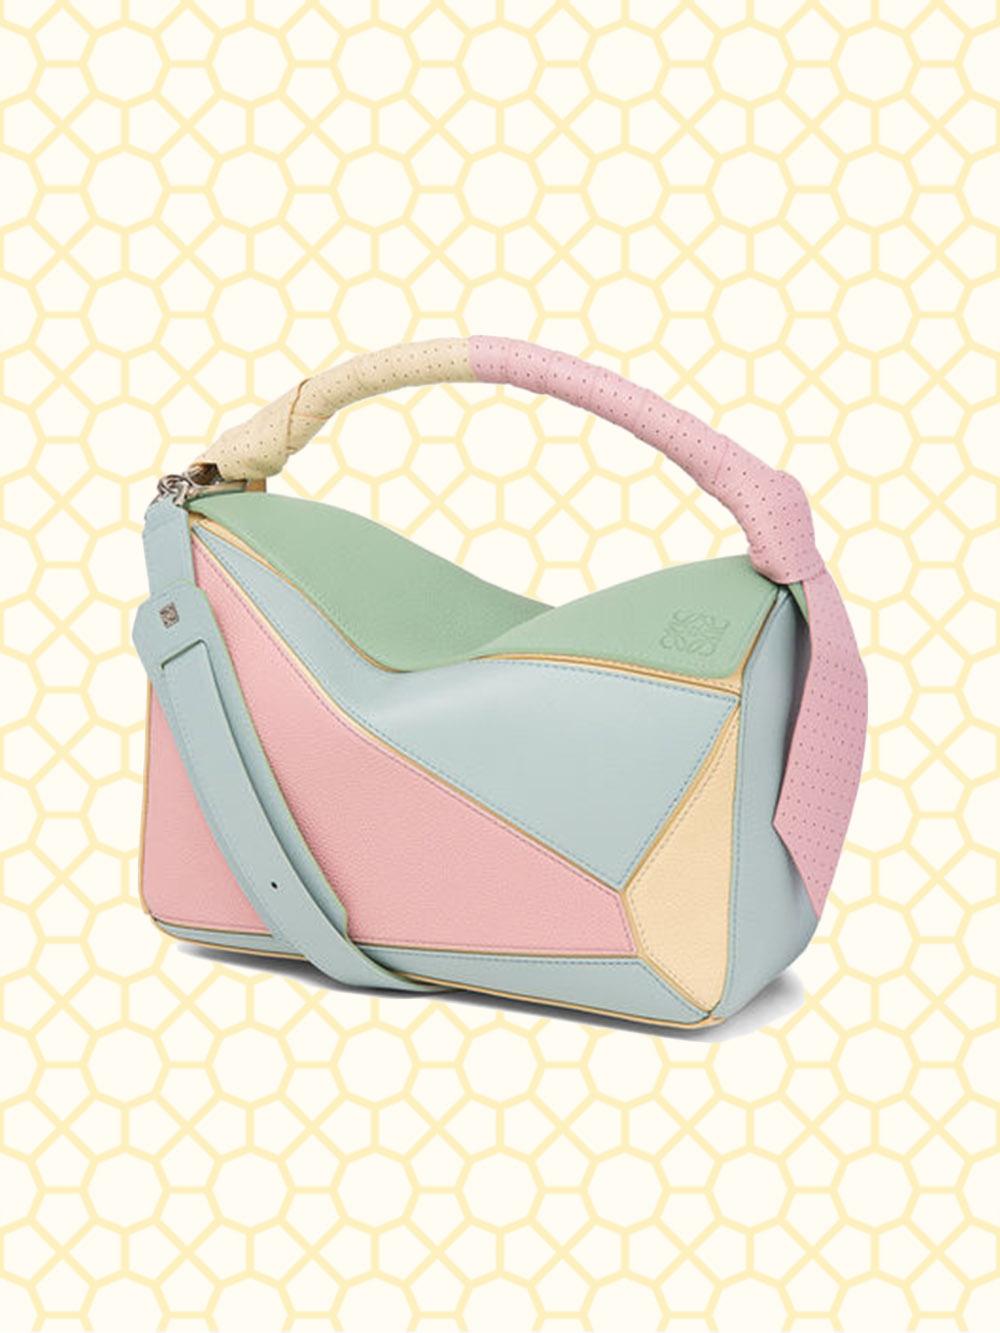 Designer Handbag Wishlist #1 Loewe Puzzle Bag